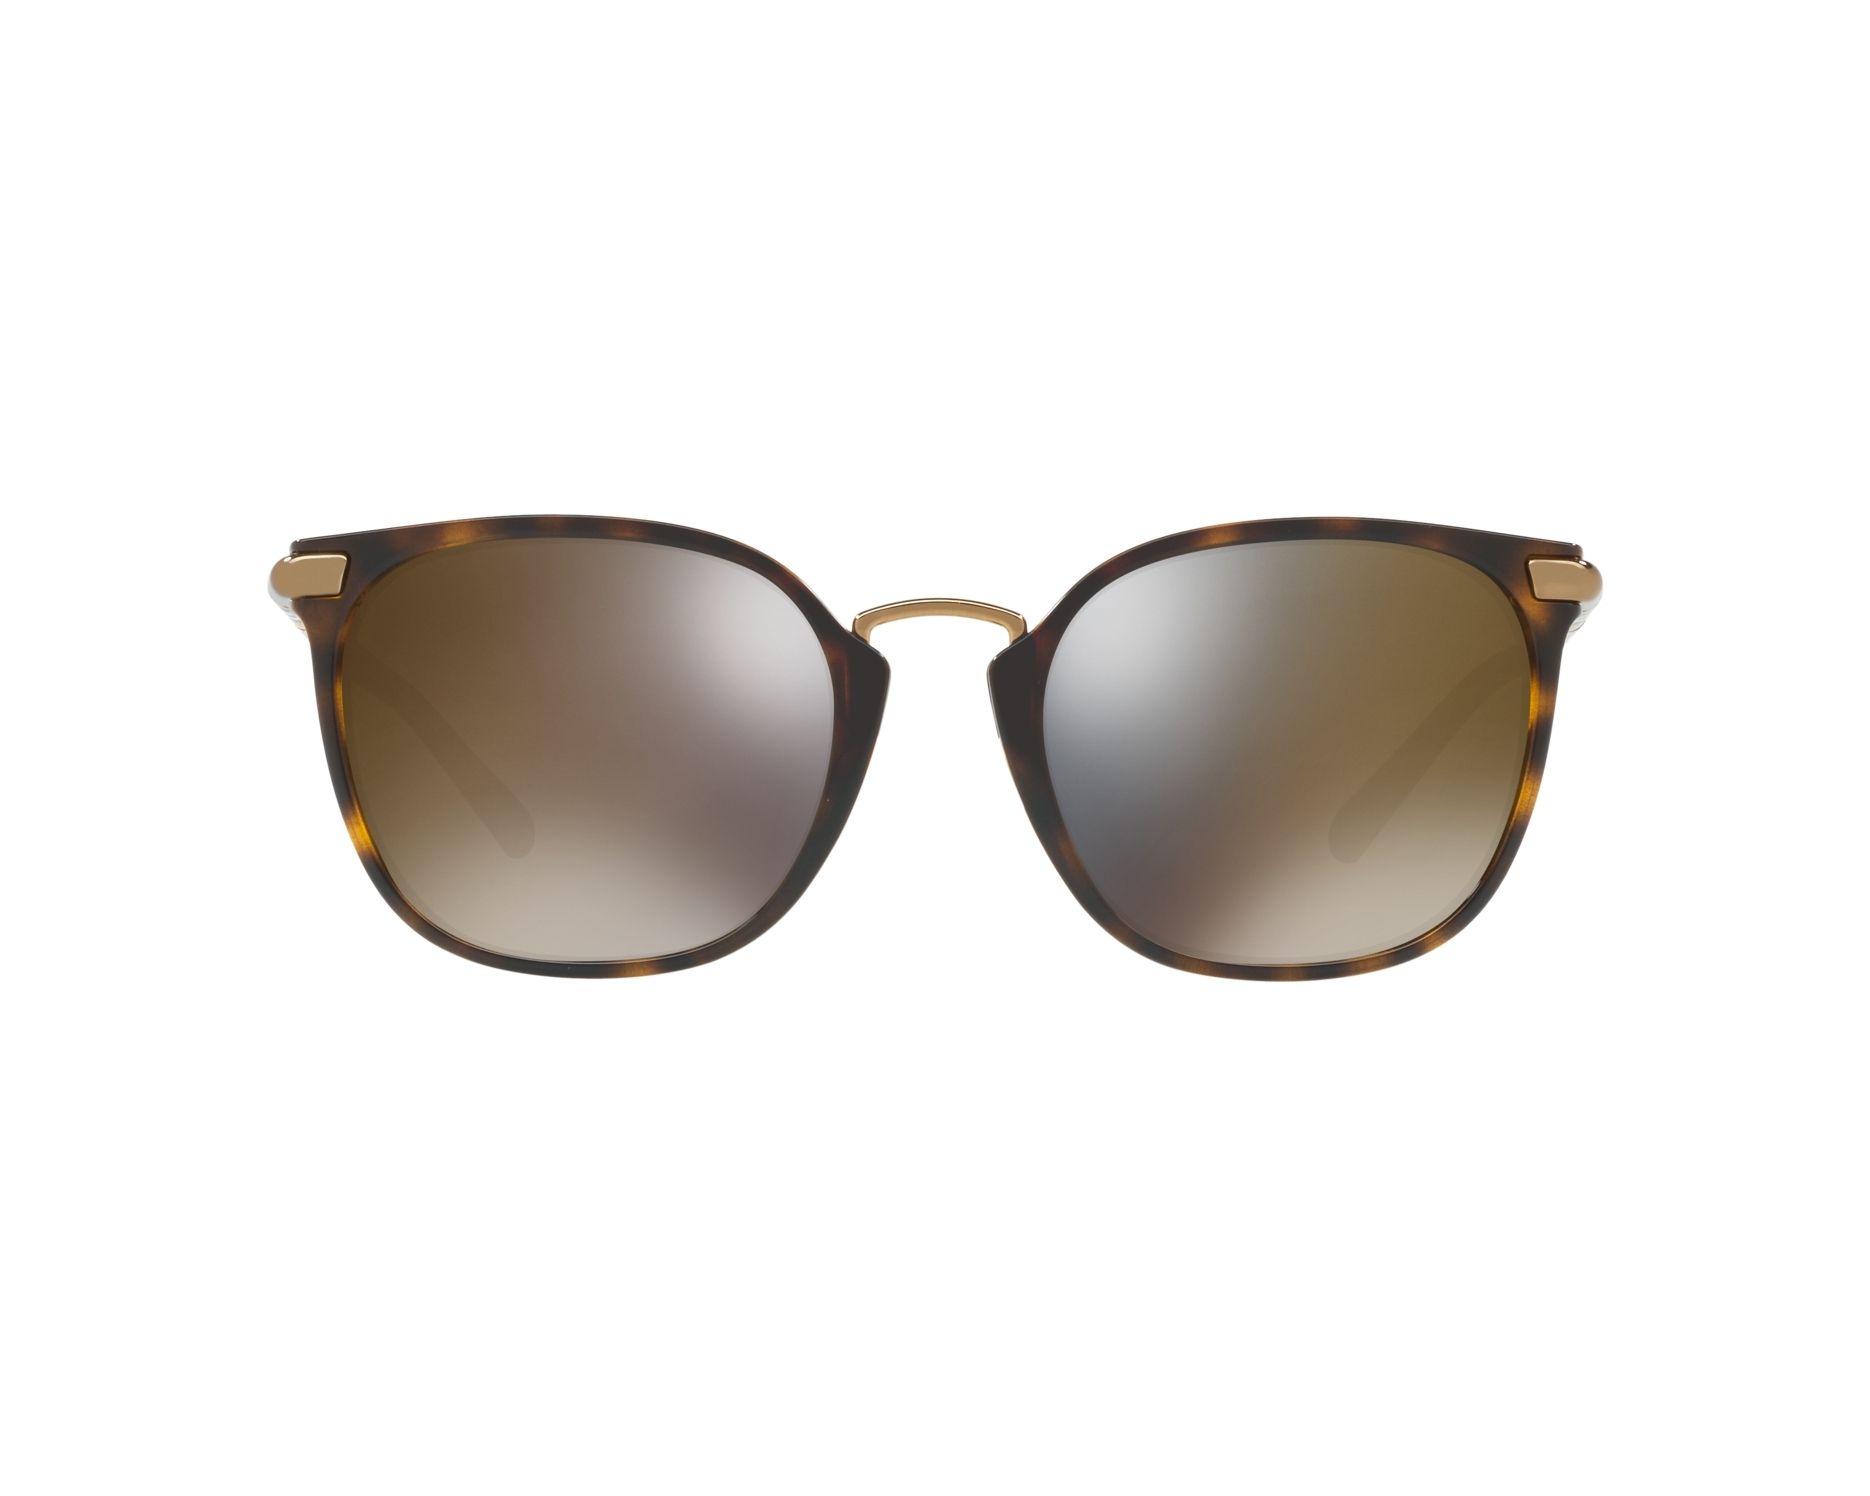 3dc34c3d57 Sunglasses Burberry BE-4262 30024T 53-21 Havana 360 degree view 1